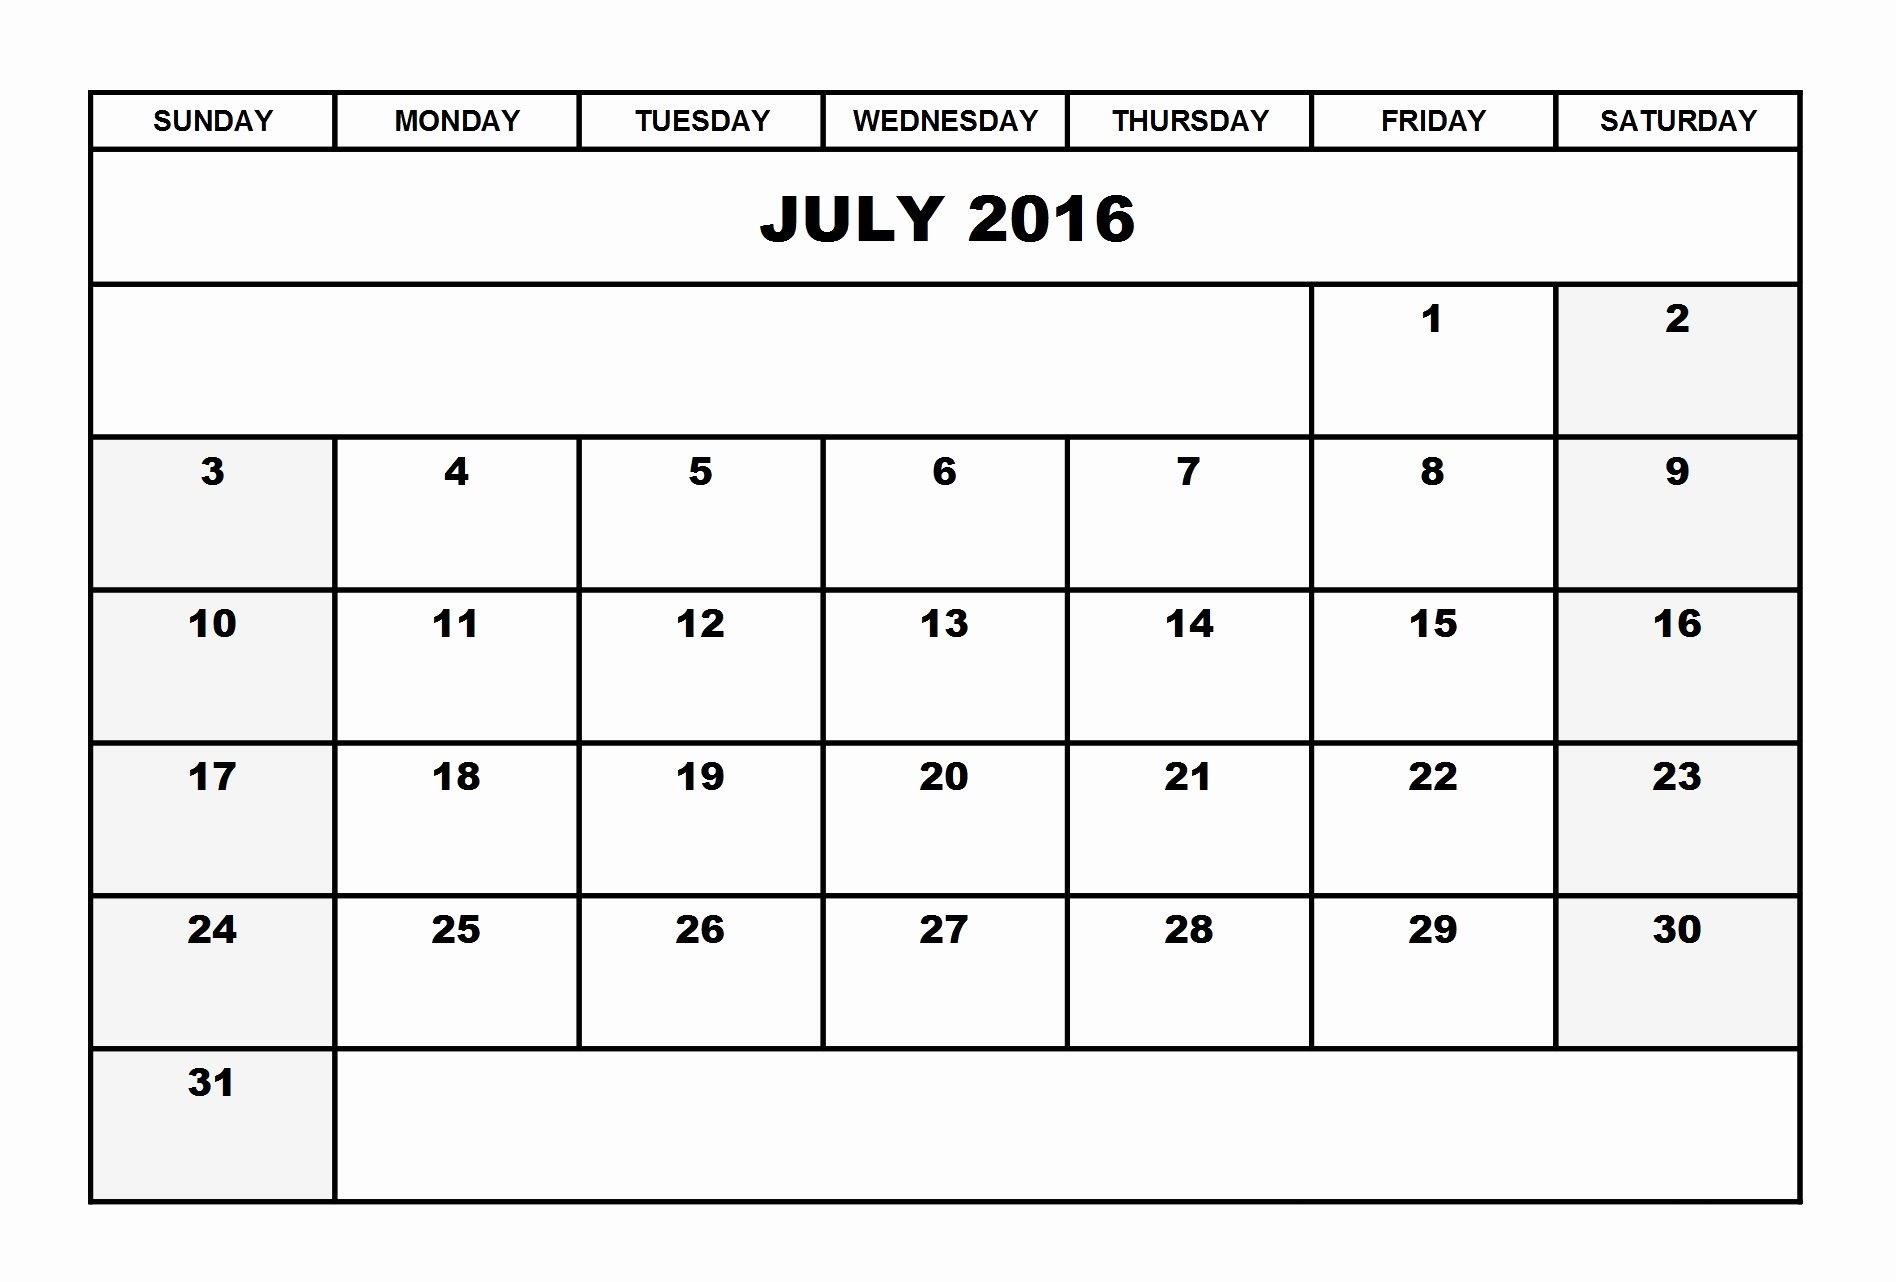 Blank Calendar Template 2016 Luxury July 2016 Calendar Landscape